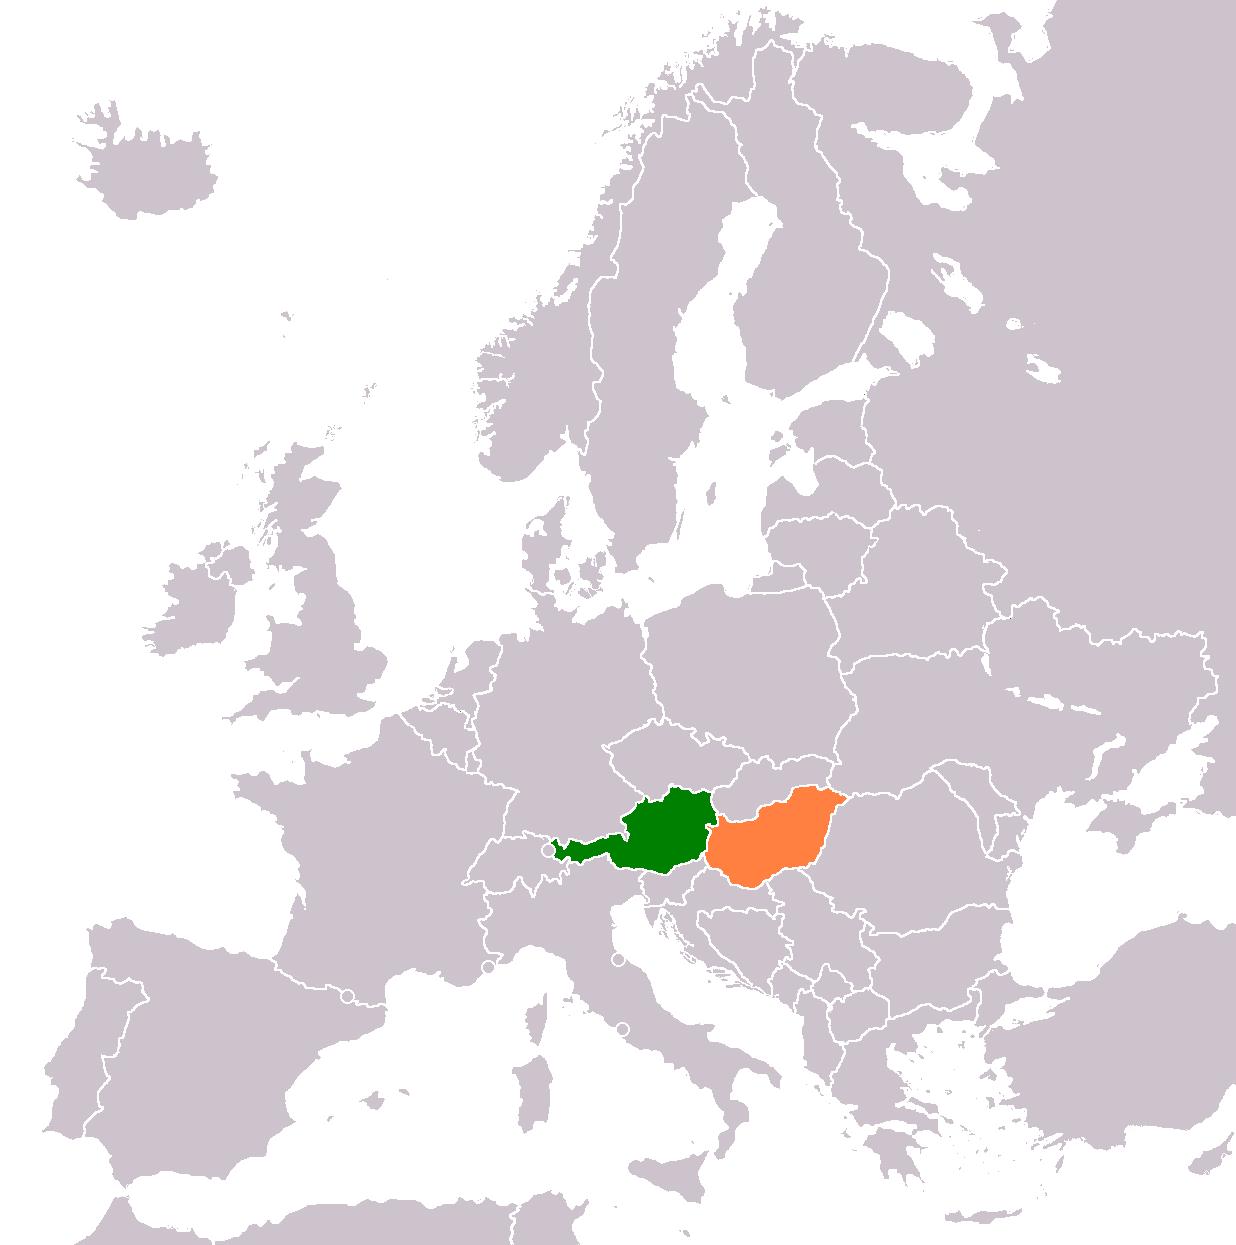 Austria hungary locator map maps pinterest austria hungary locator map gumiabroncs Images